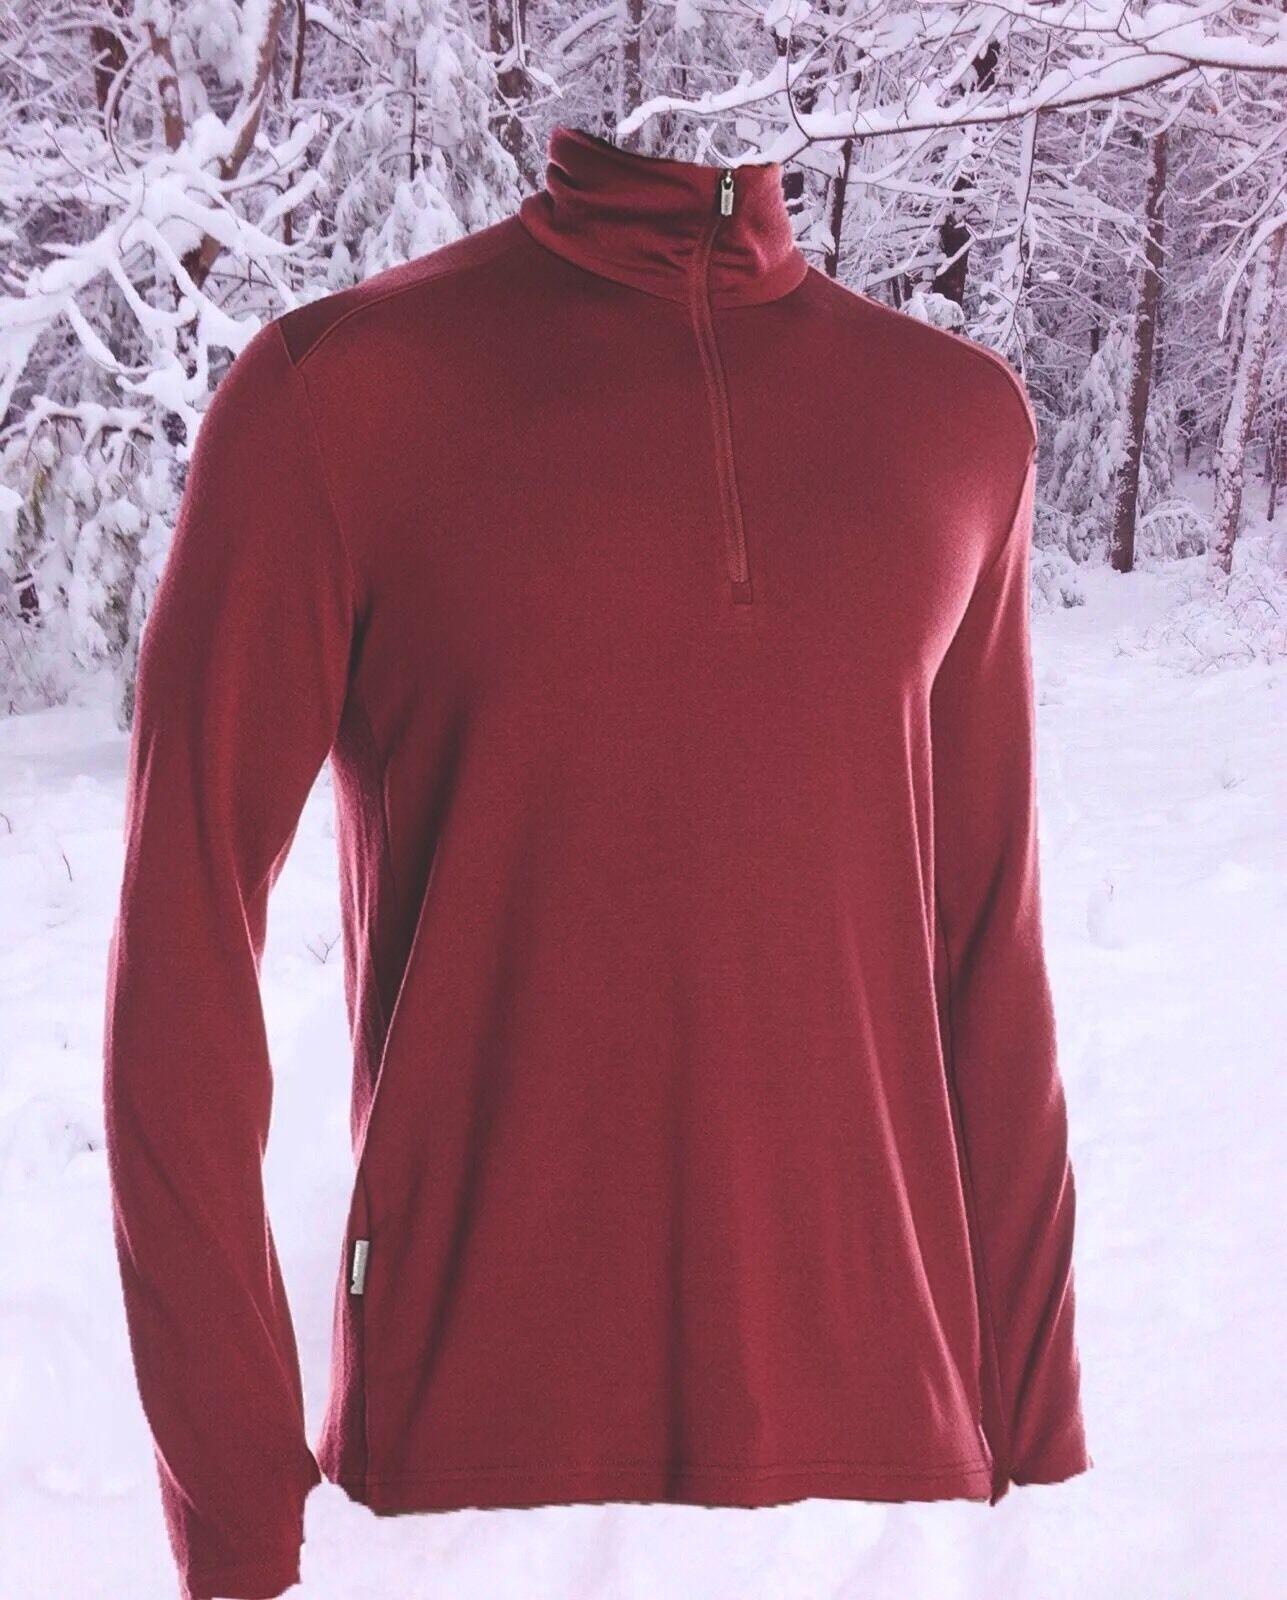 Icebreaker Mens XL Long Sleeve 260g Merino Wool Tech Sports Ski Top Nwt  120